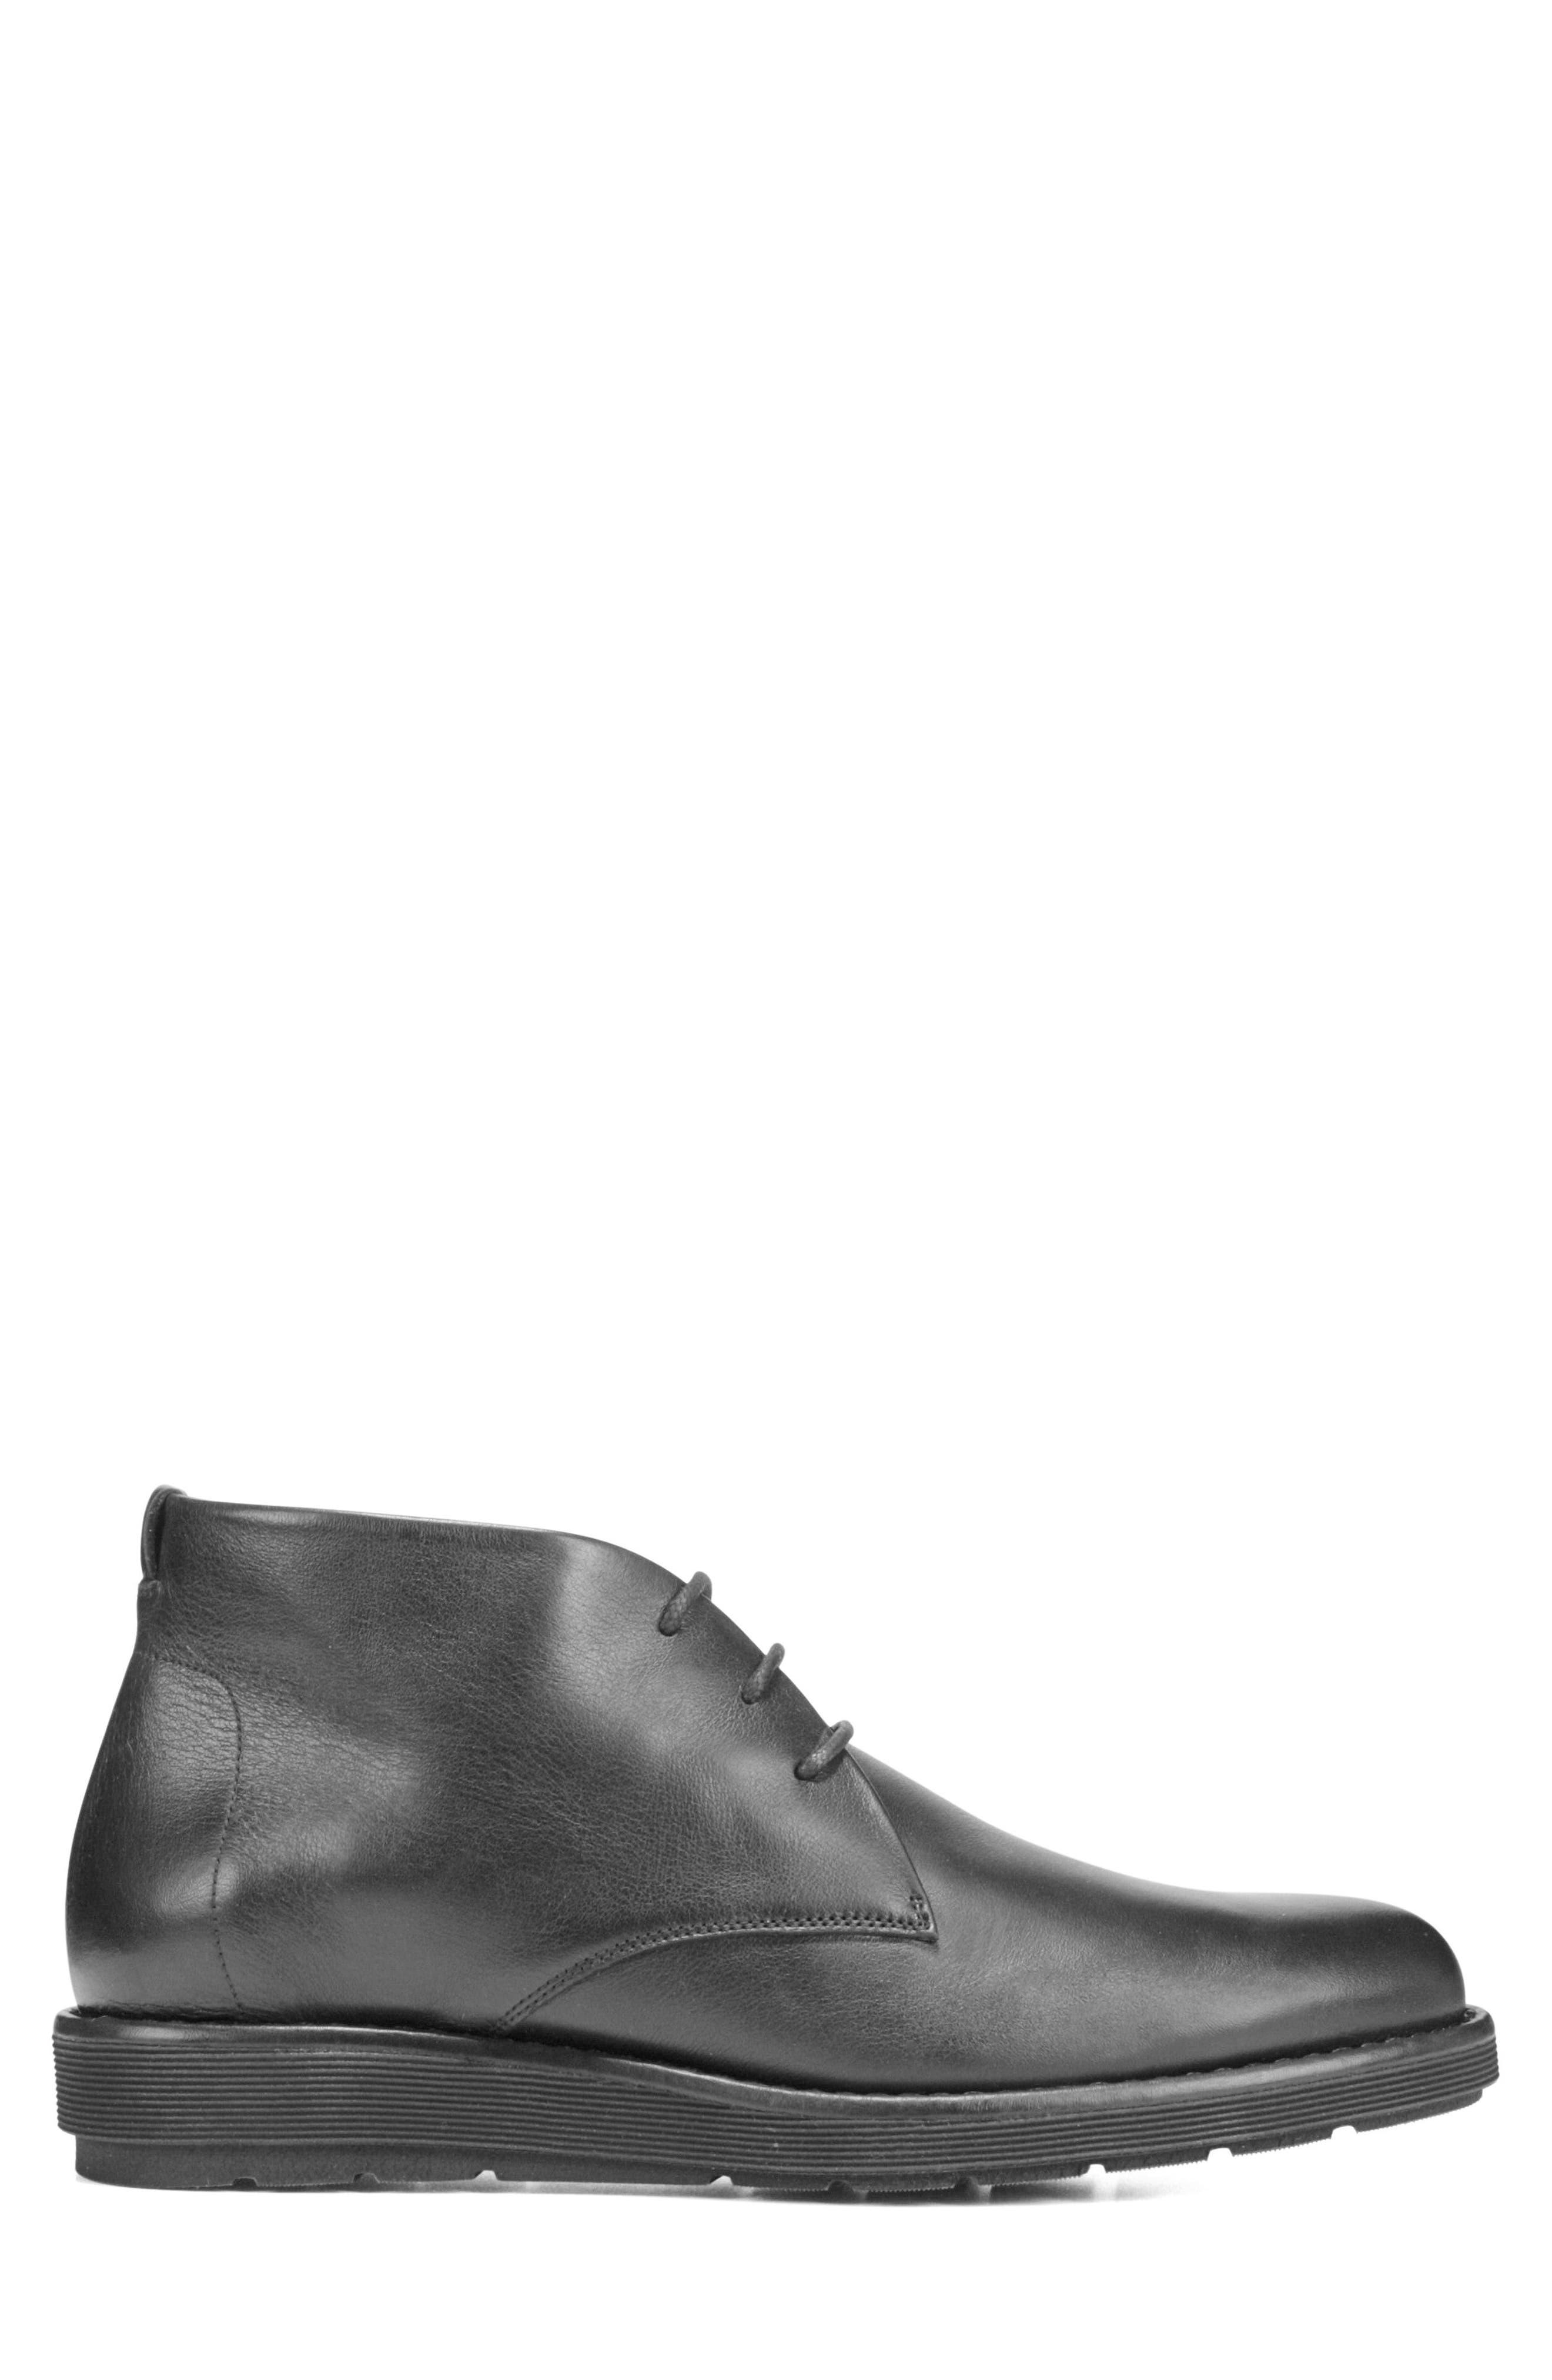 Walden Chukka Boot,                             Alternate thumbnail 3, color,                             BLACK